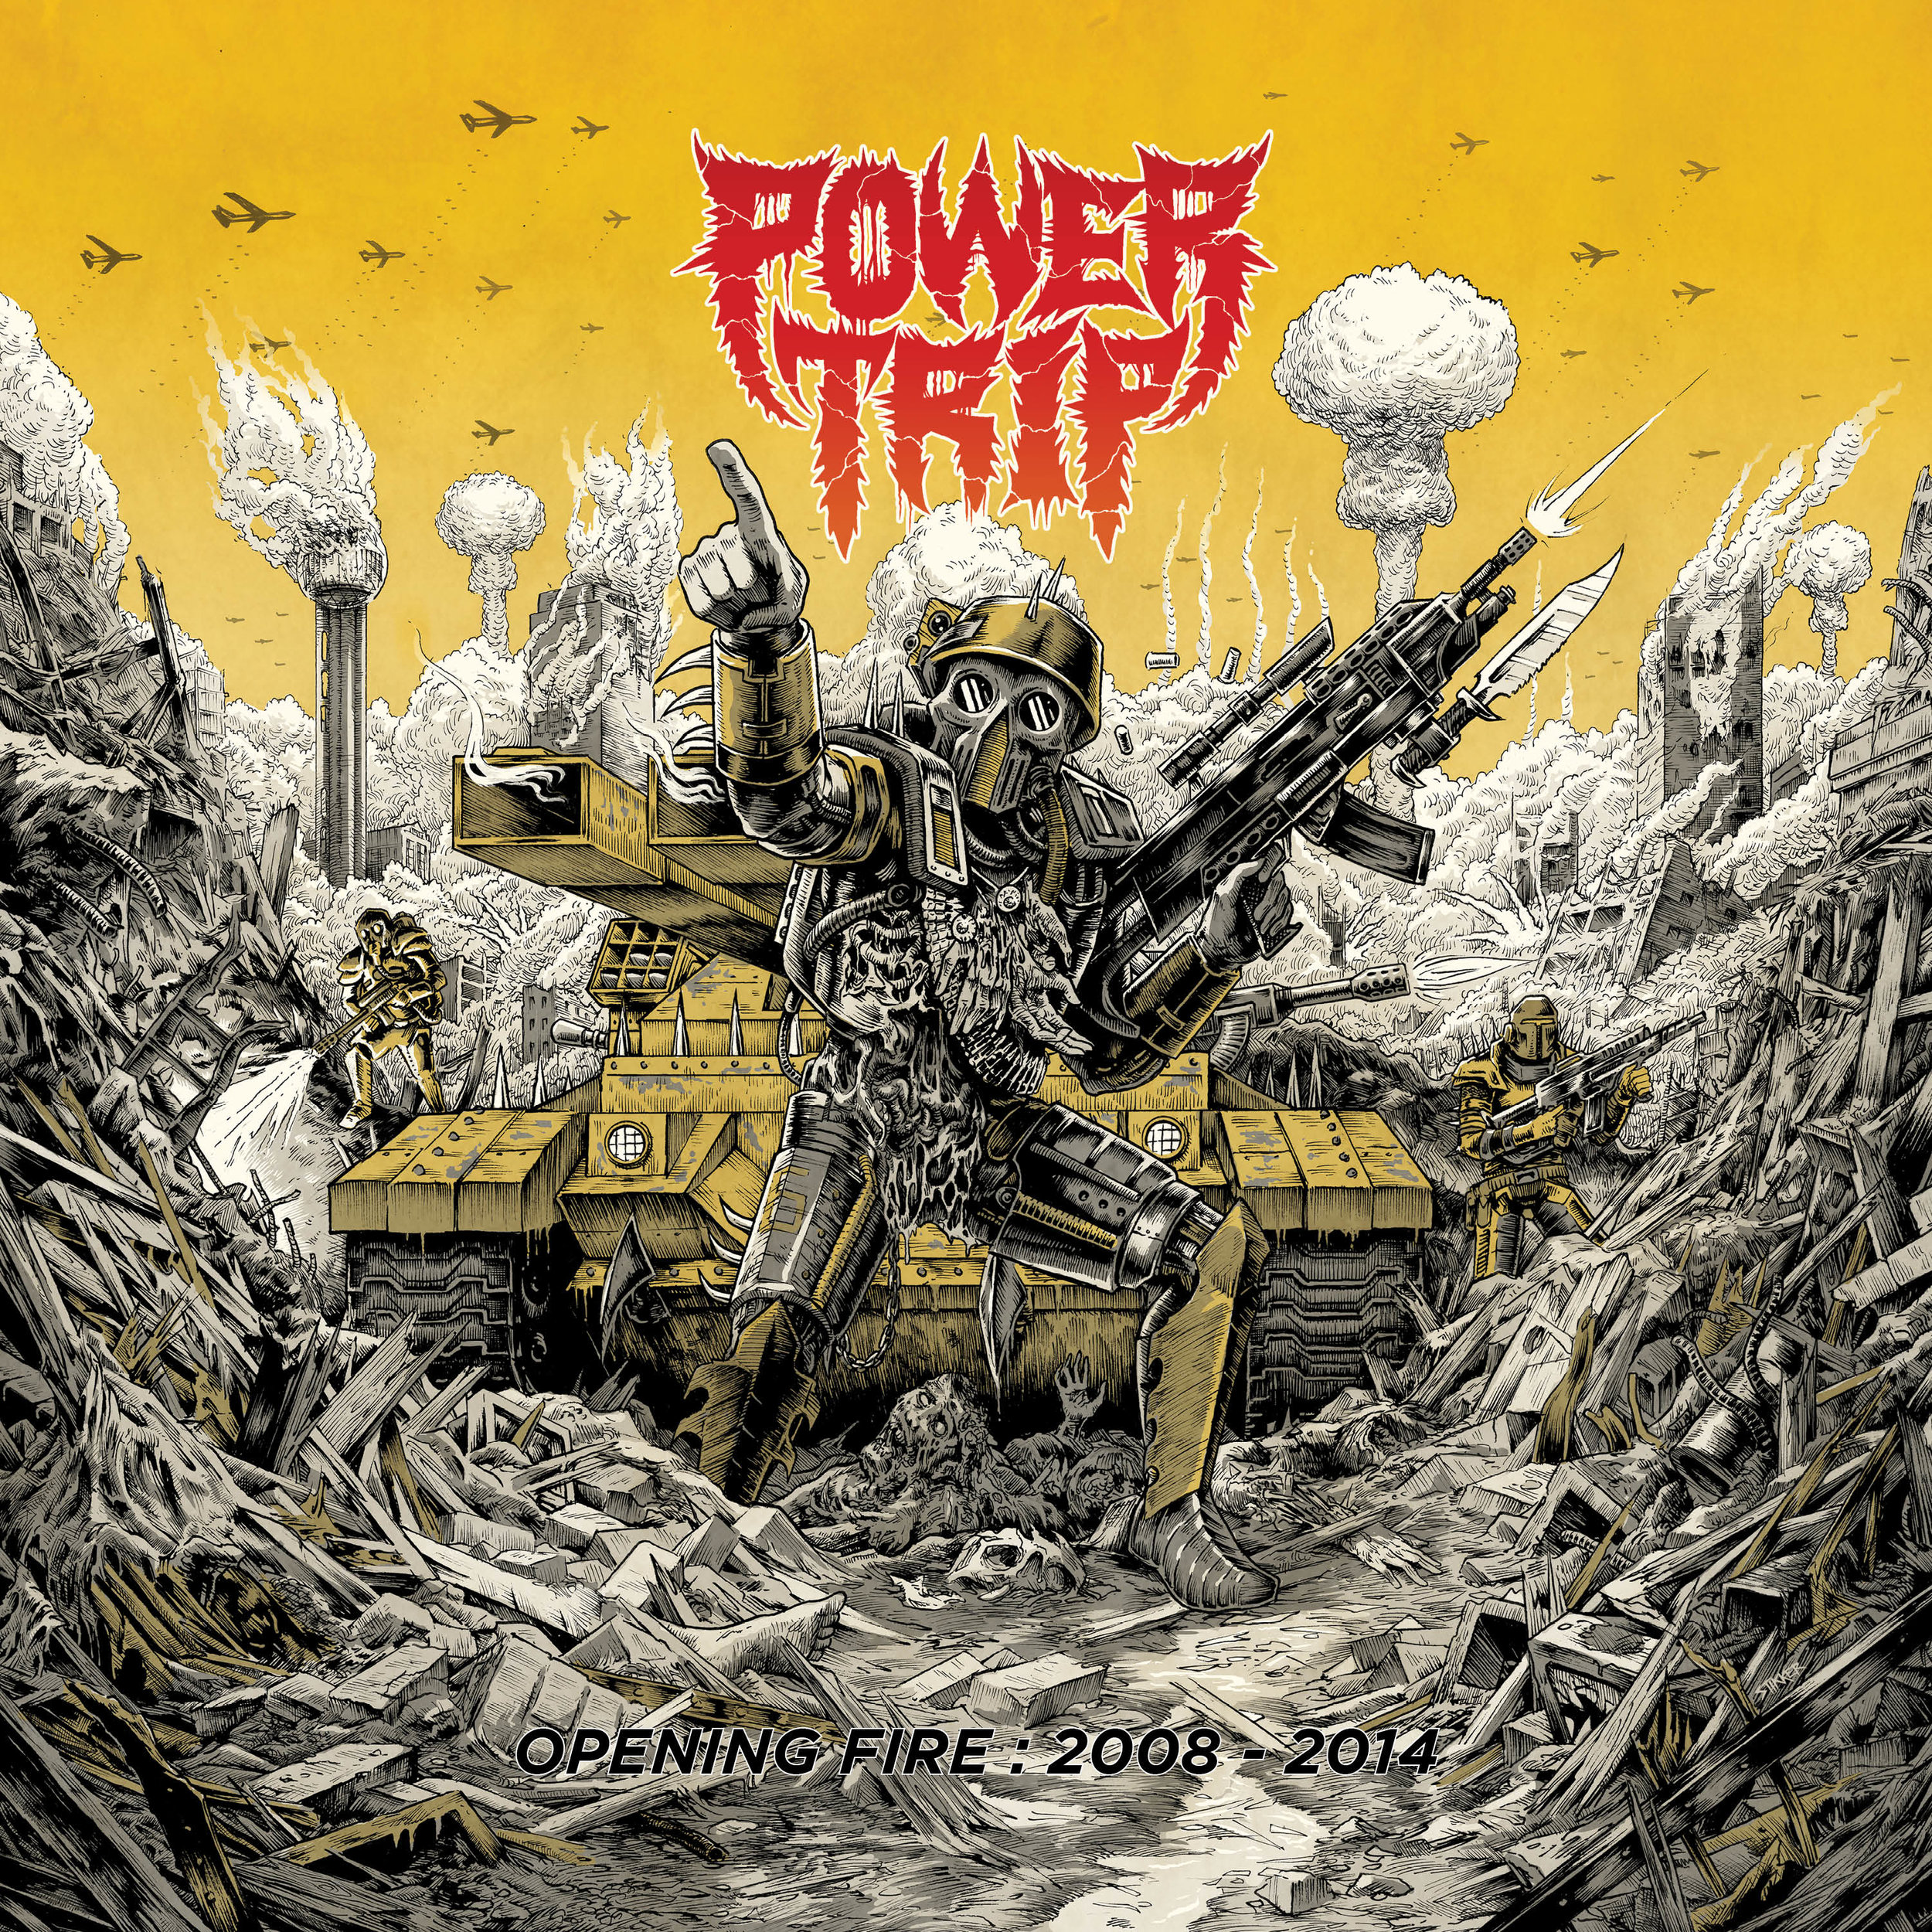 OPS011 - POWER TRIPOpening fire: 2008 - 2014 LP | CD | DIGITAL